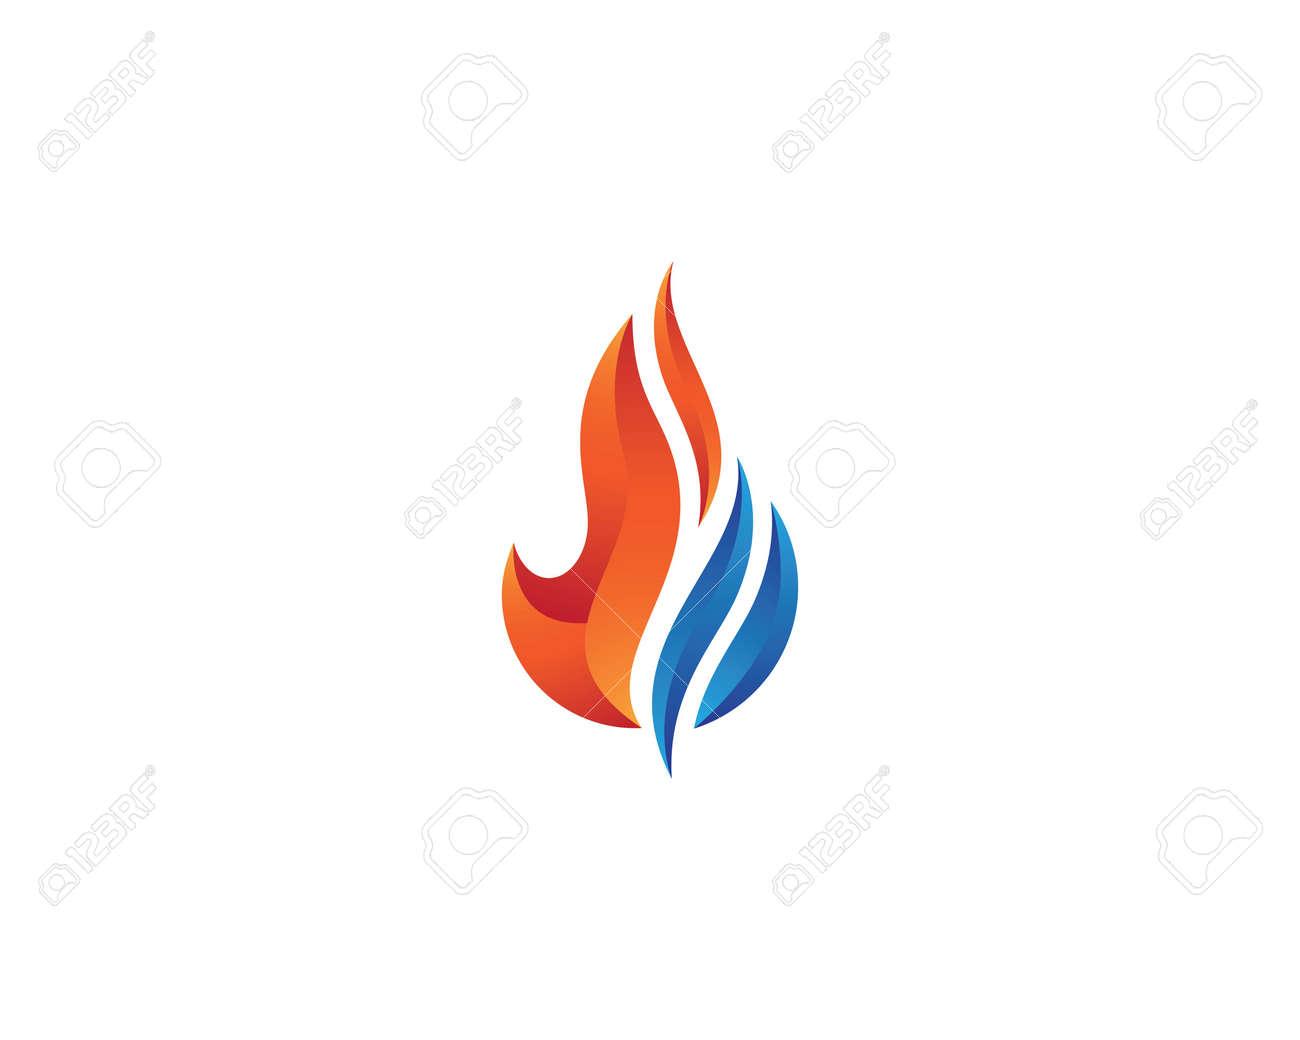 Fire flame logo template vector icon Oil, gas and energy logo concept - 145147202